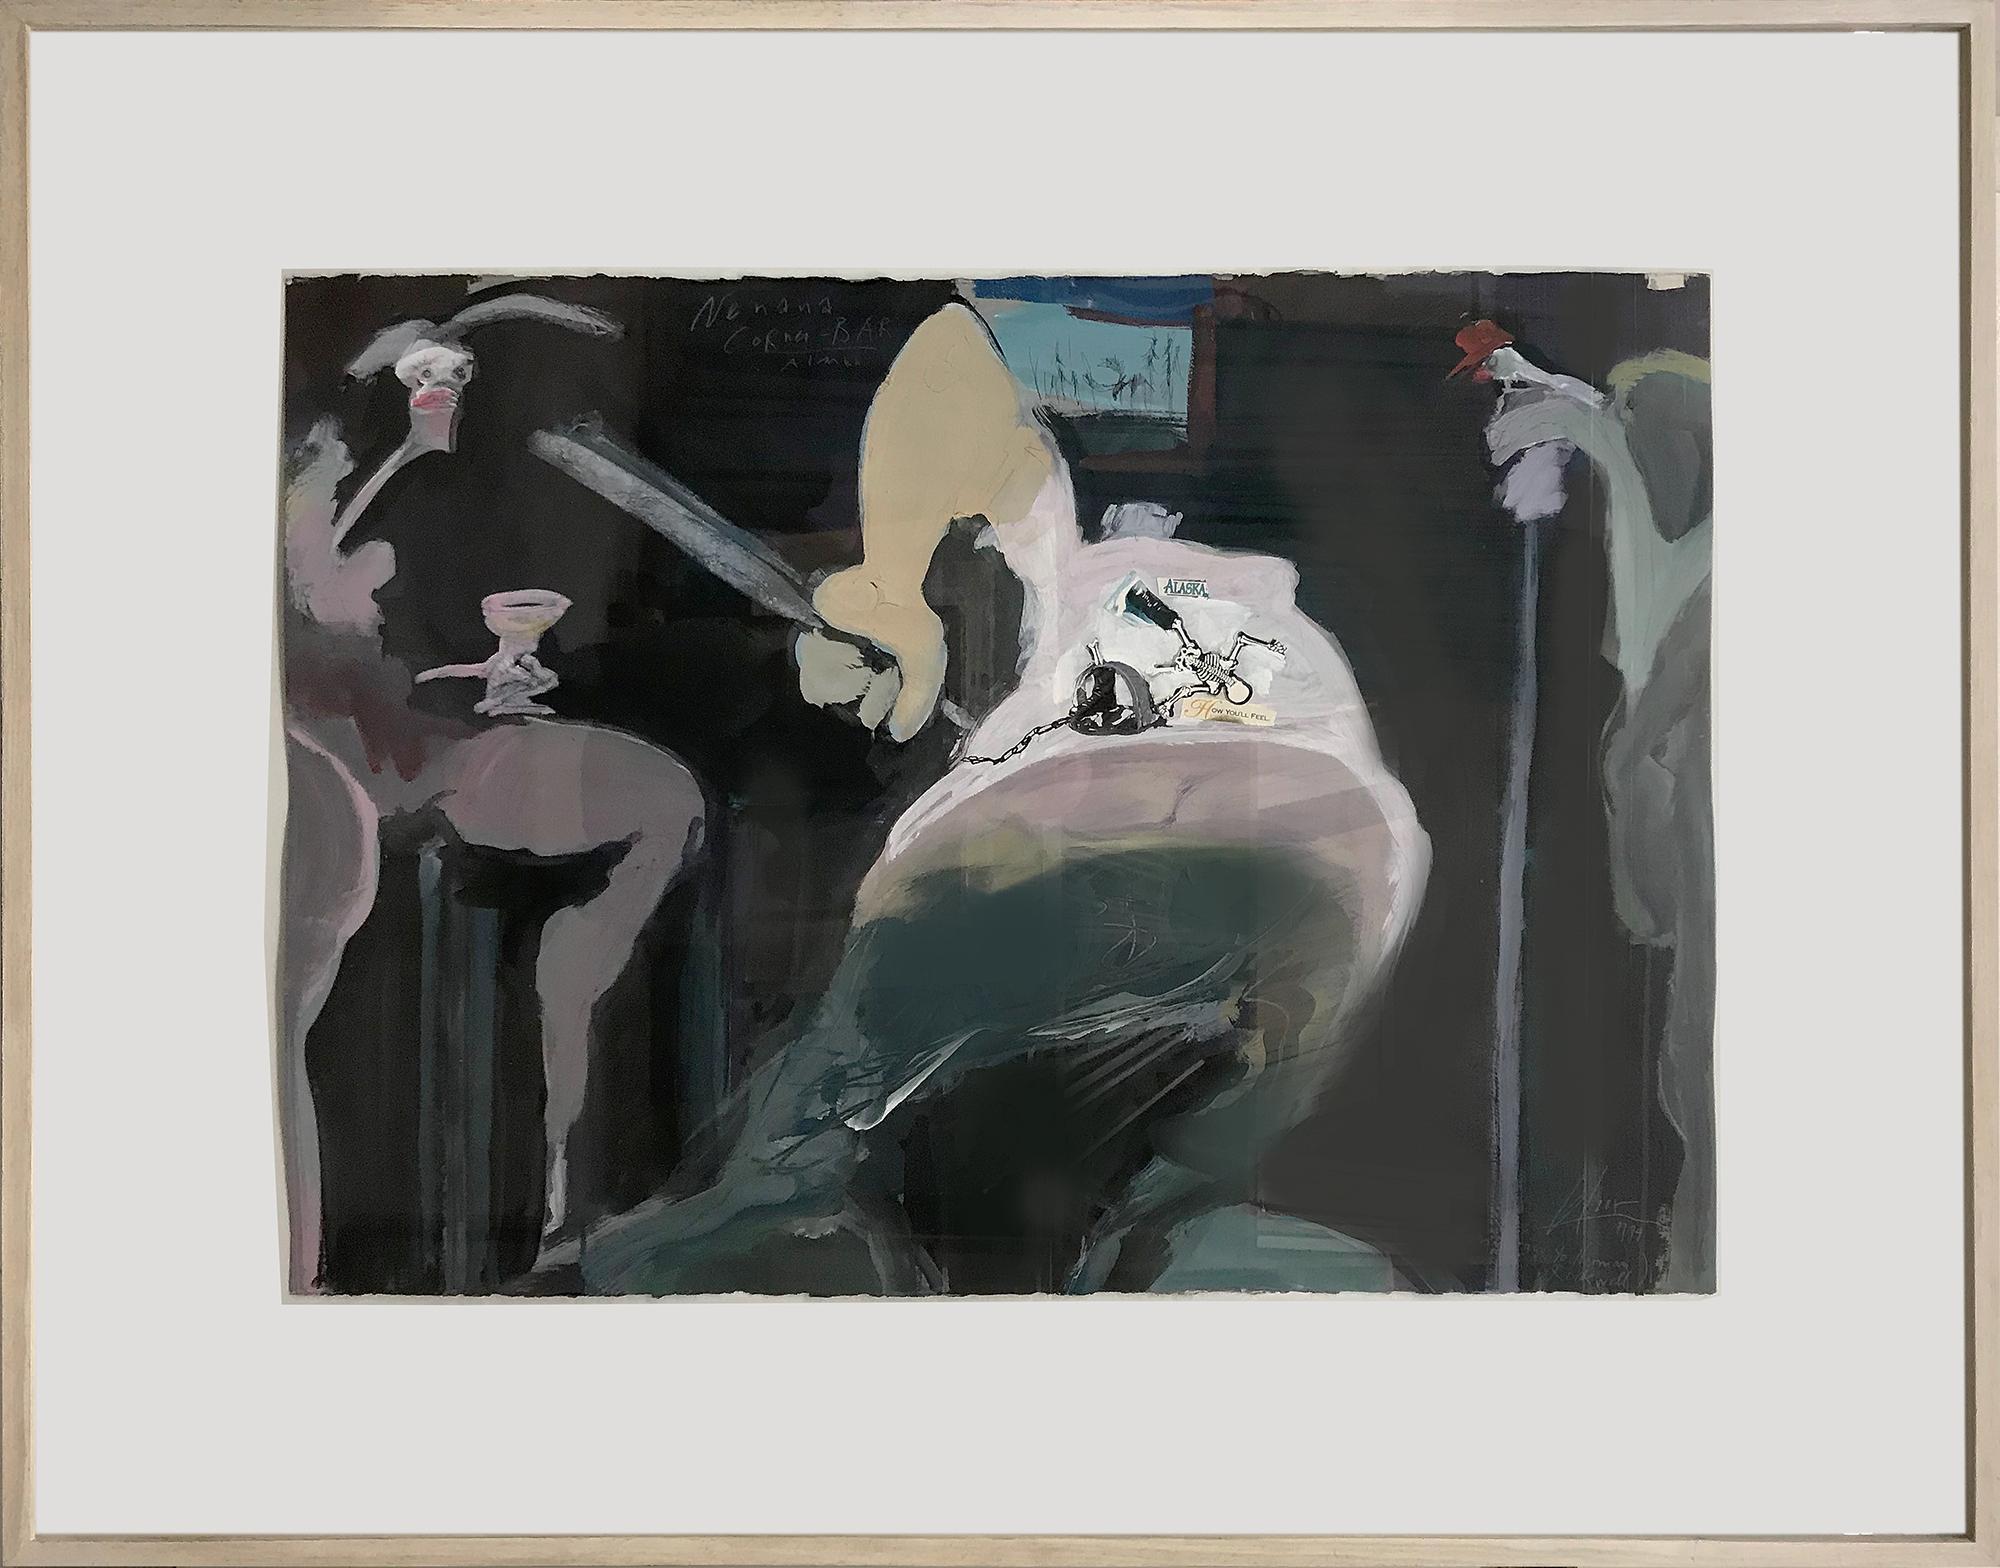 Pay Hommage to Norman, 1999, Mischtechnik auf Büttenpapier, 100 x 70 cm, Rahmenmass 138 x 105 cm